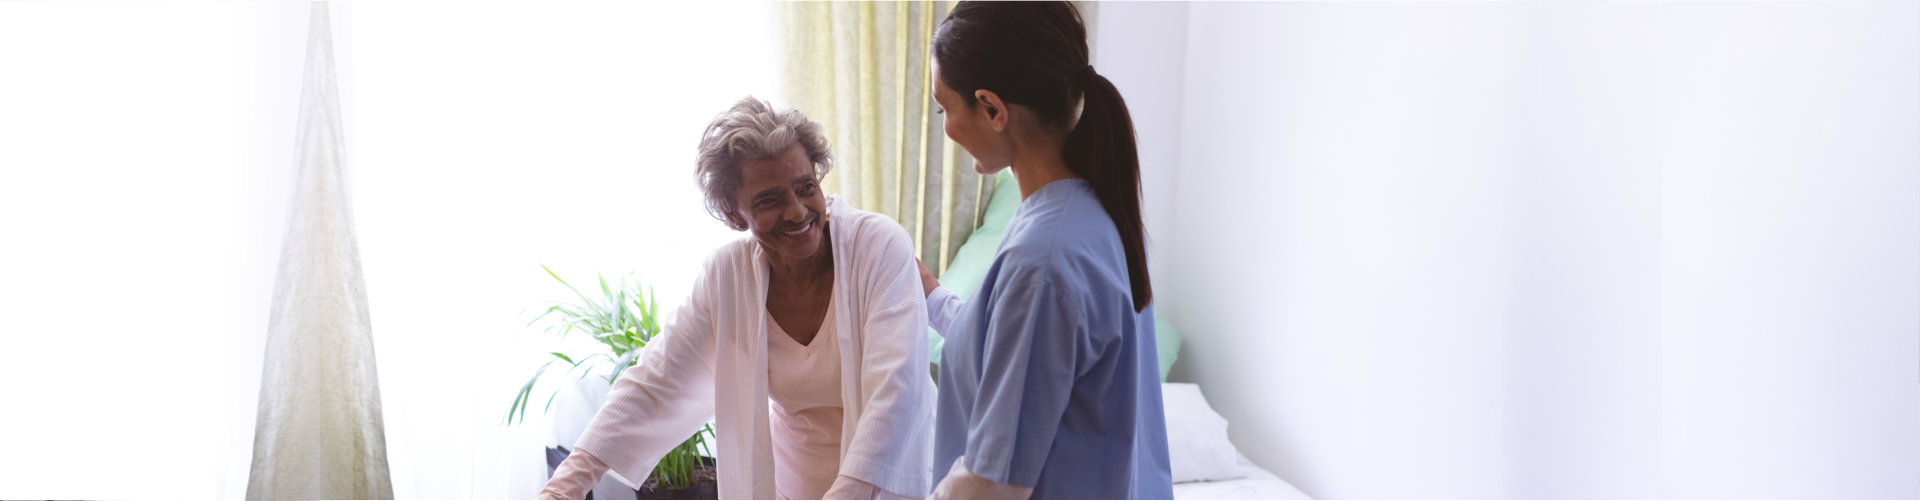 caregiver smiling with her senior patient